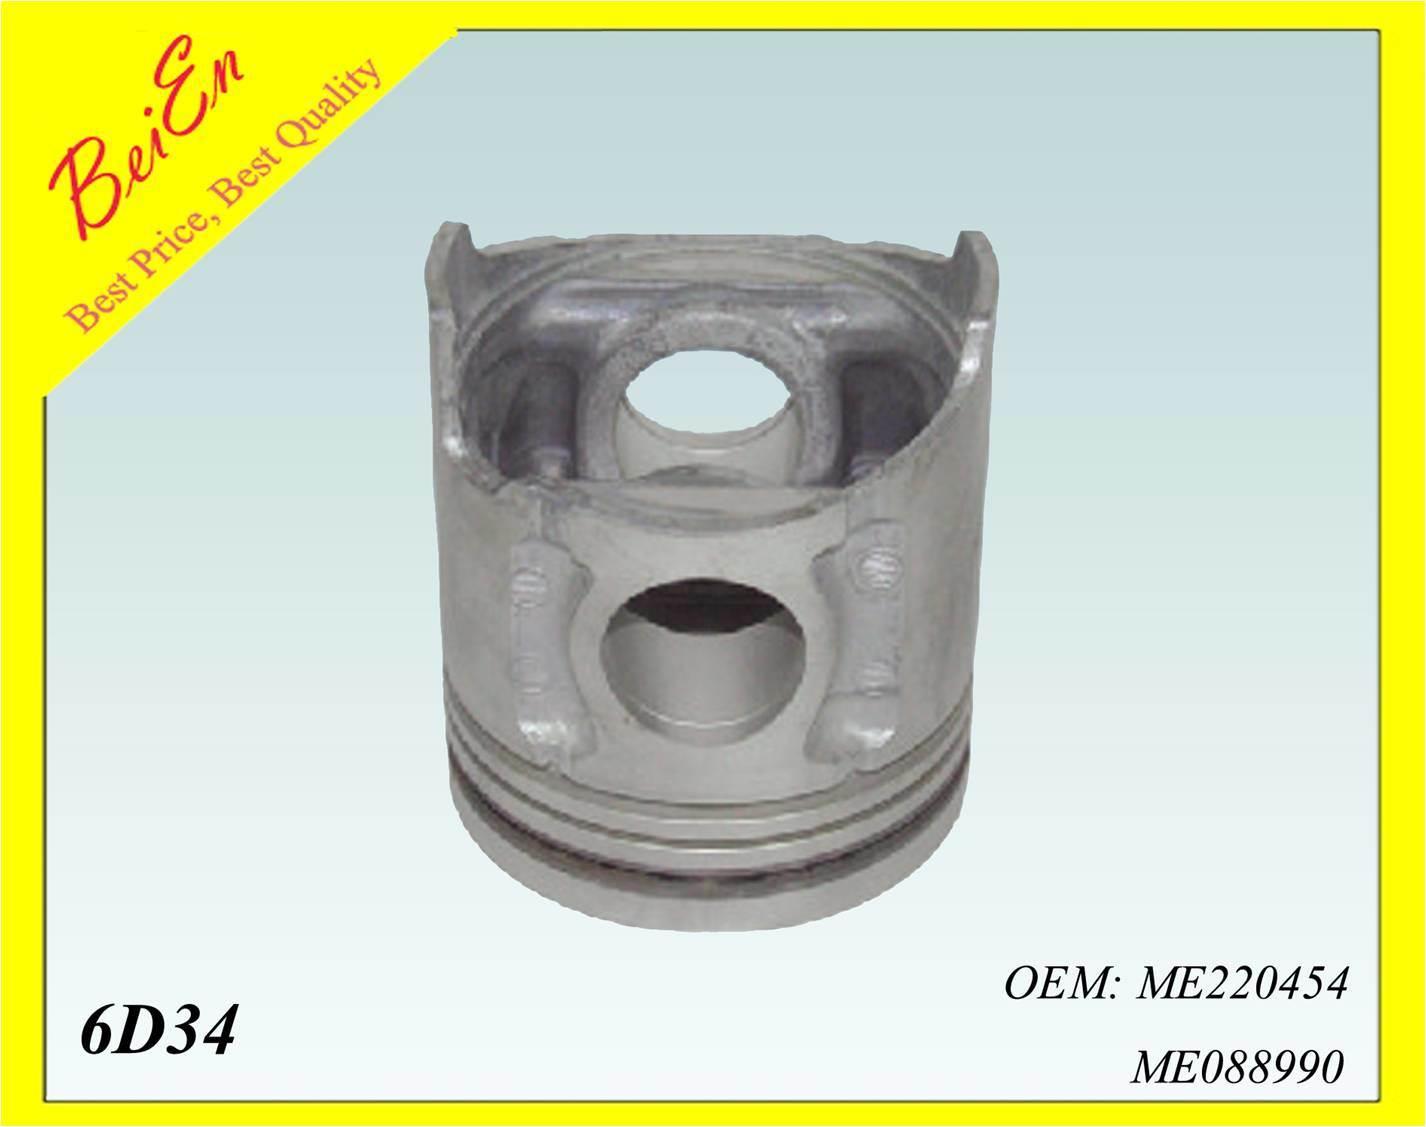 Piston Formitsubishi Excavator Engine 6D34 Model (PART NUMBER: ME220454/ME088990)